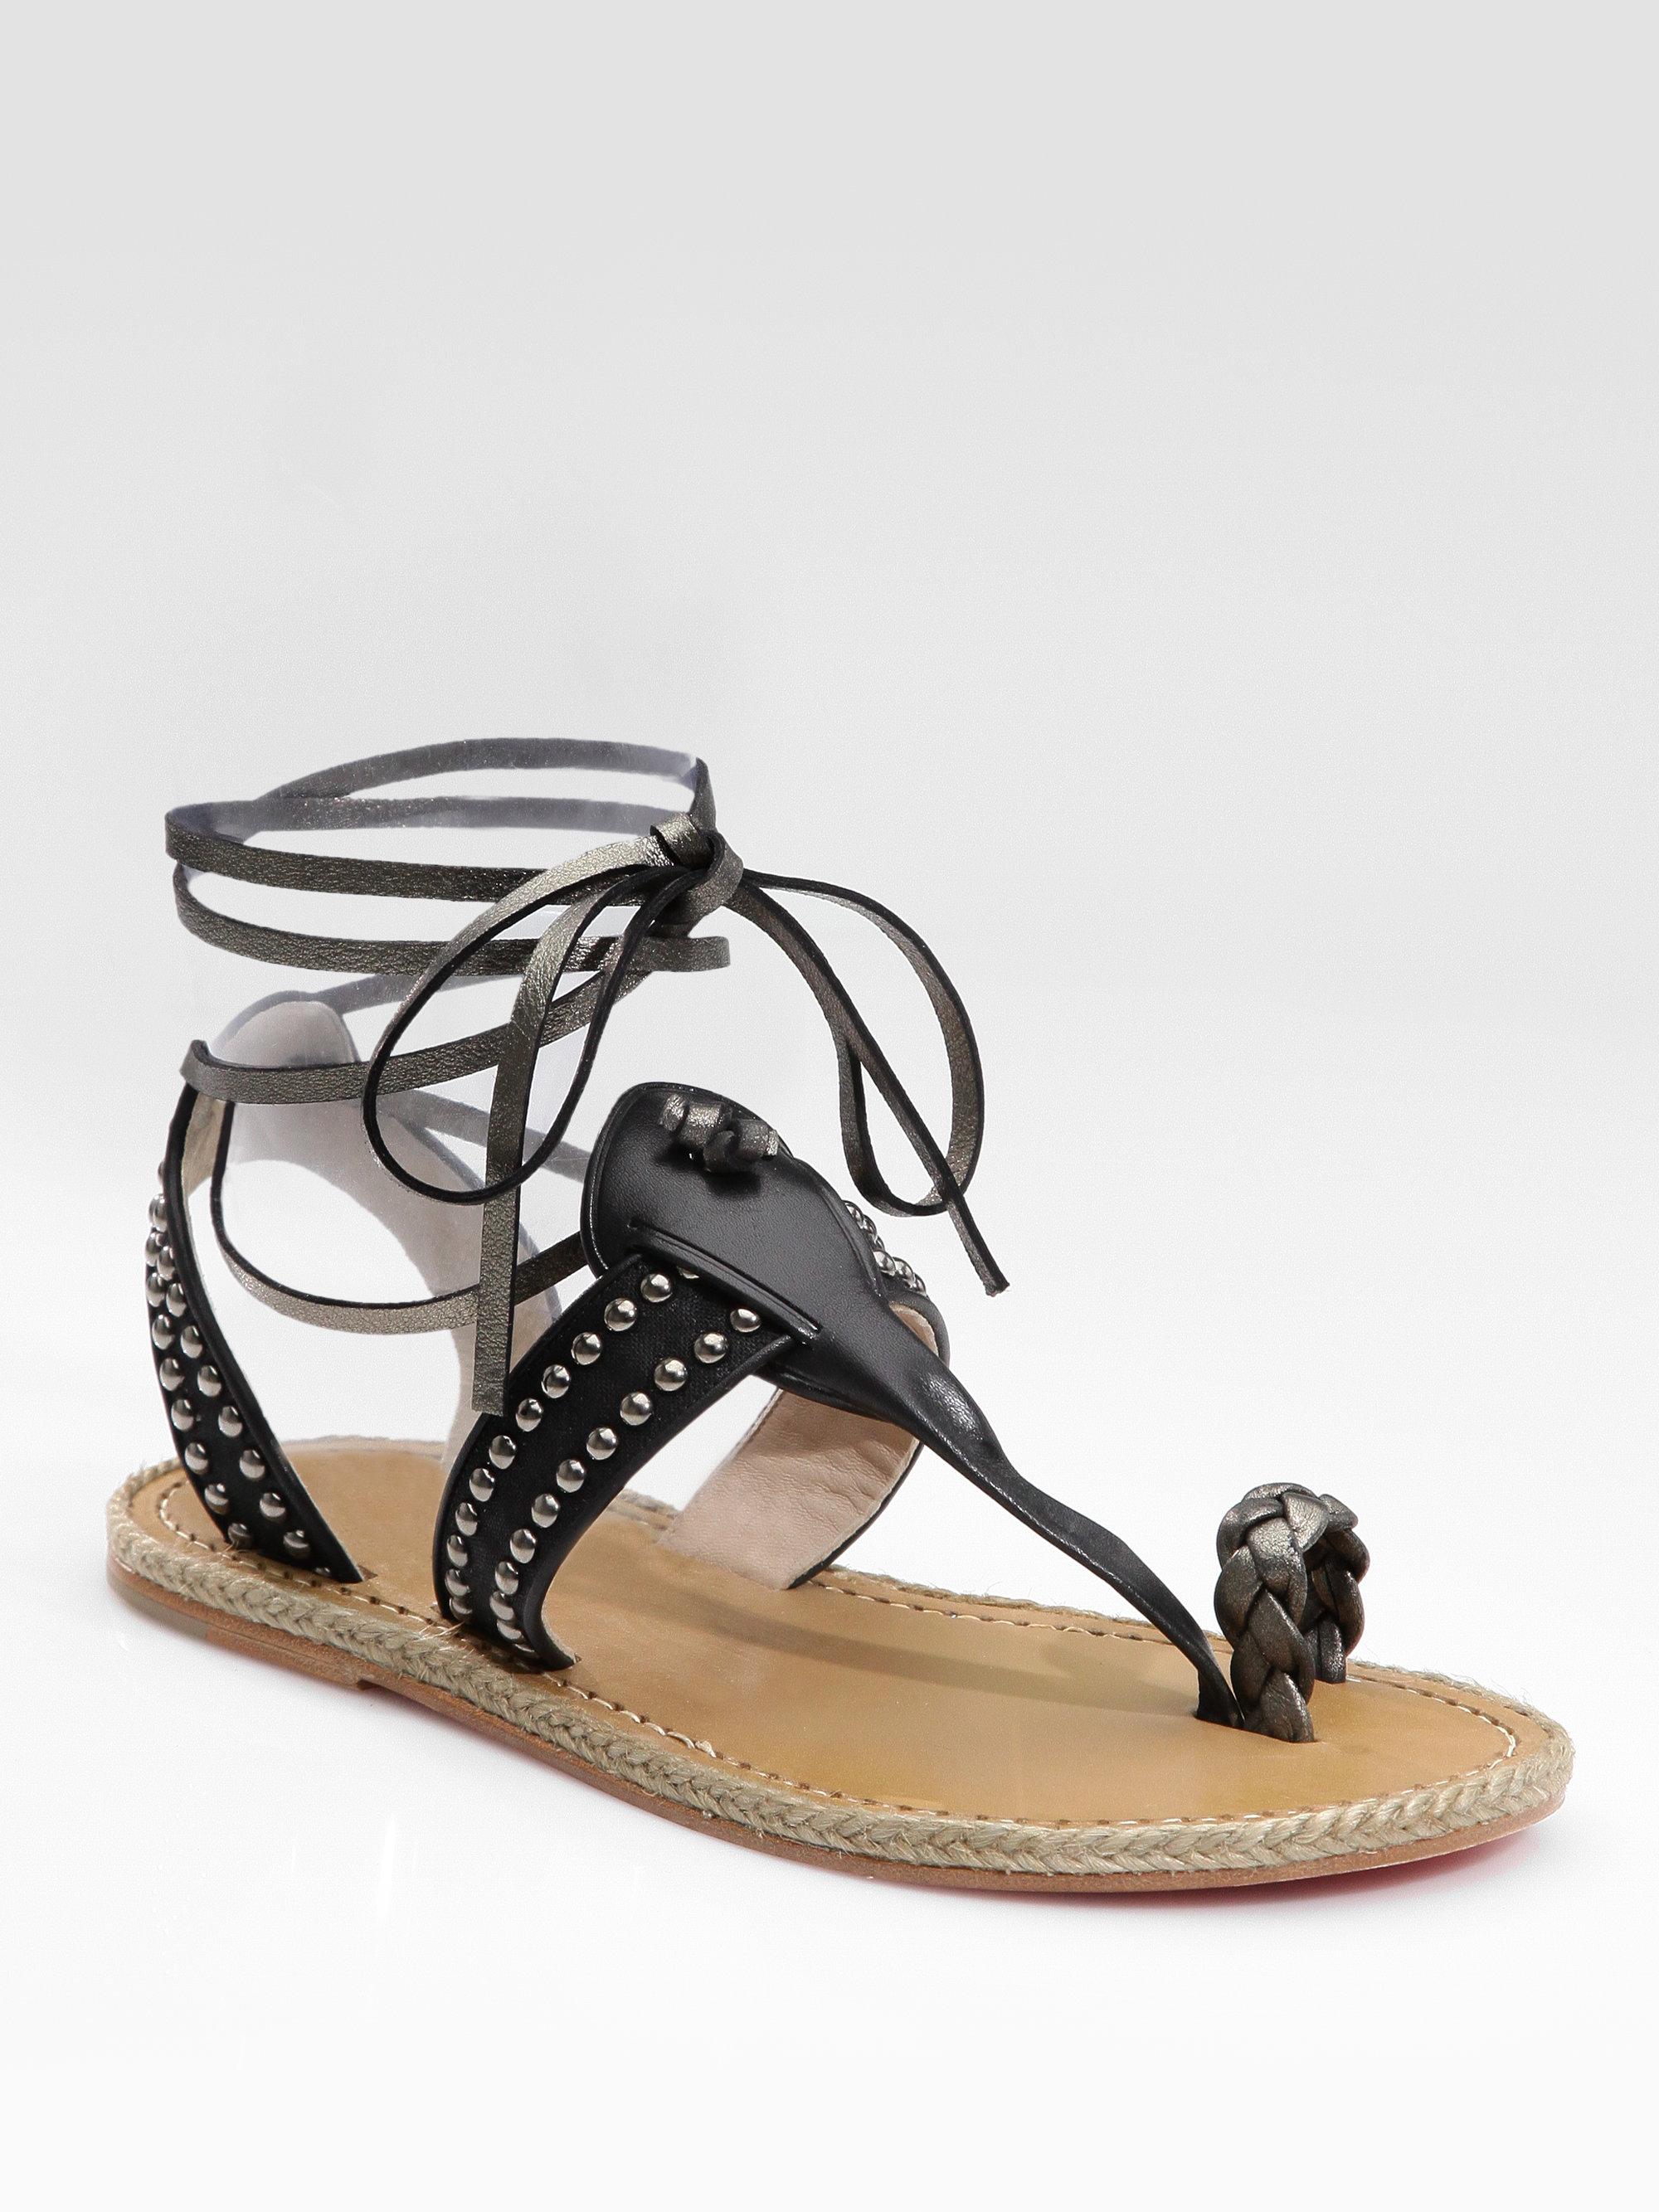 20ea6502fef1 ... norway lyst christian louboutin flat gladiator sandals in black 0c89b  7ea47